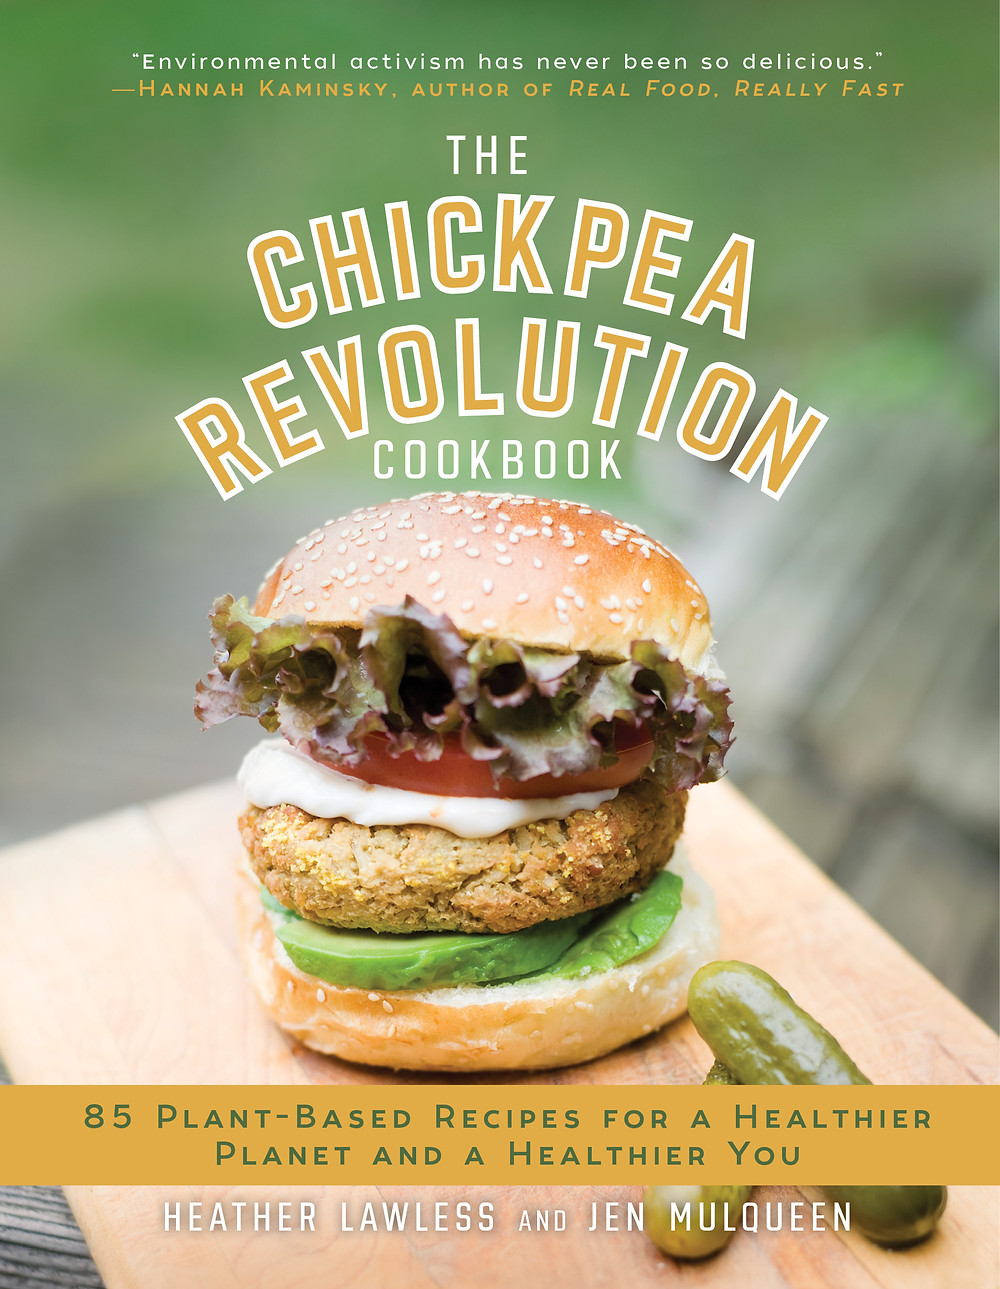 Chickpea Revolution